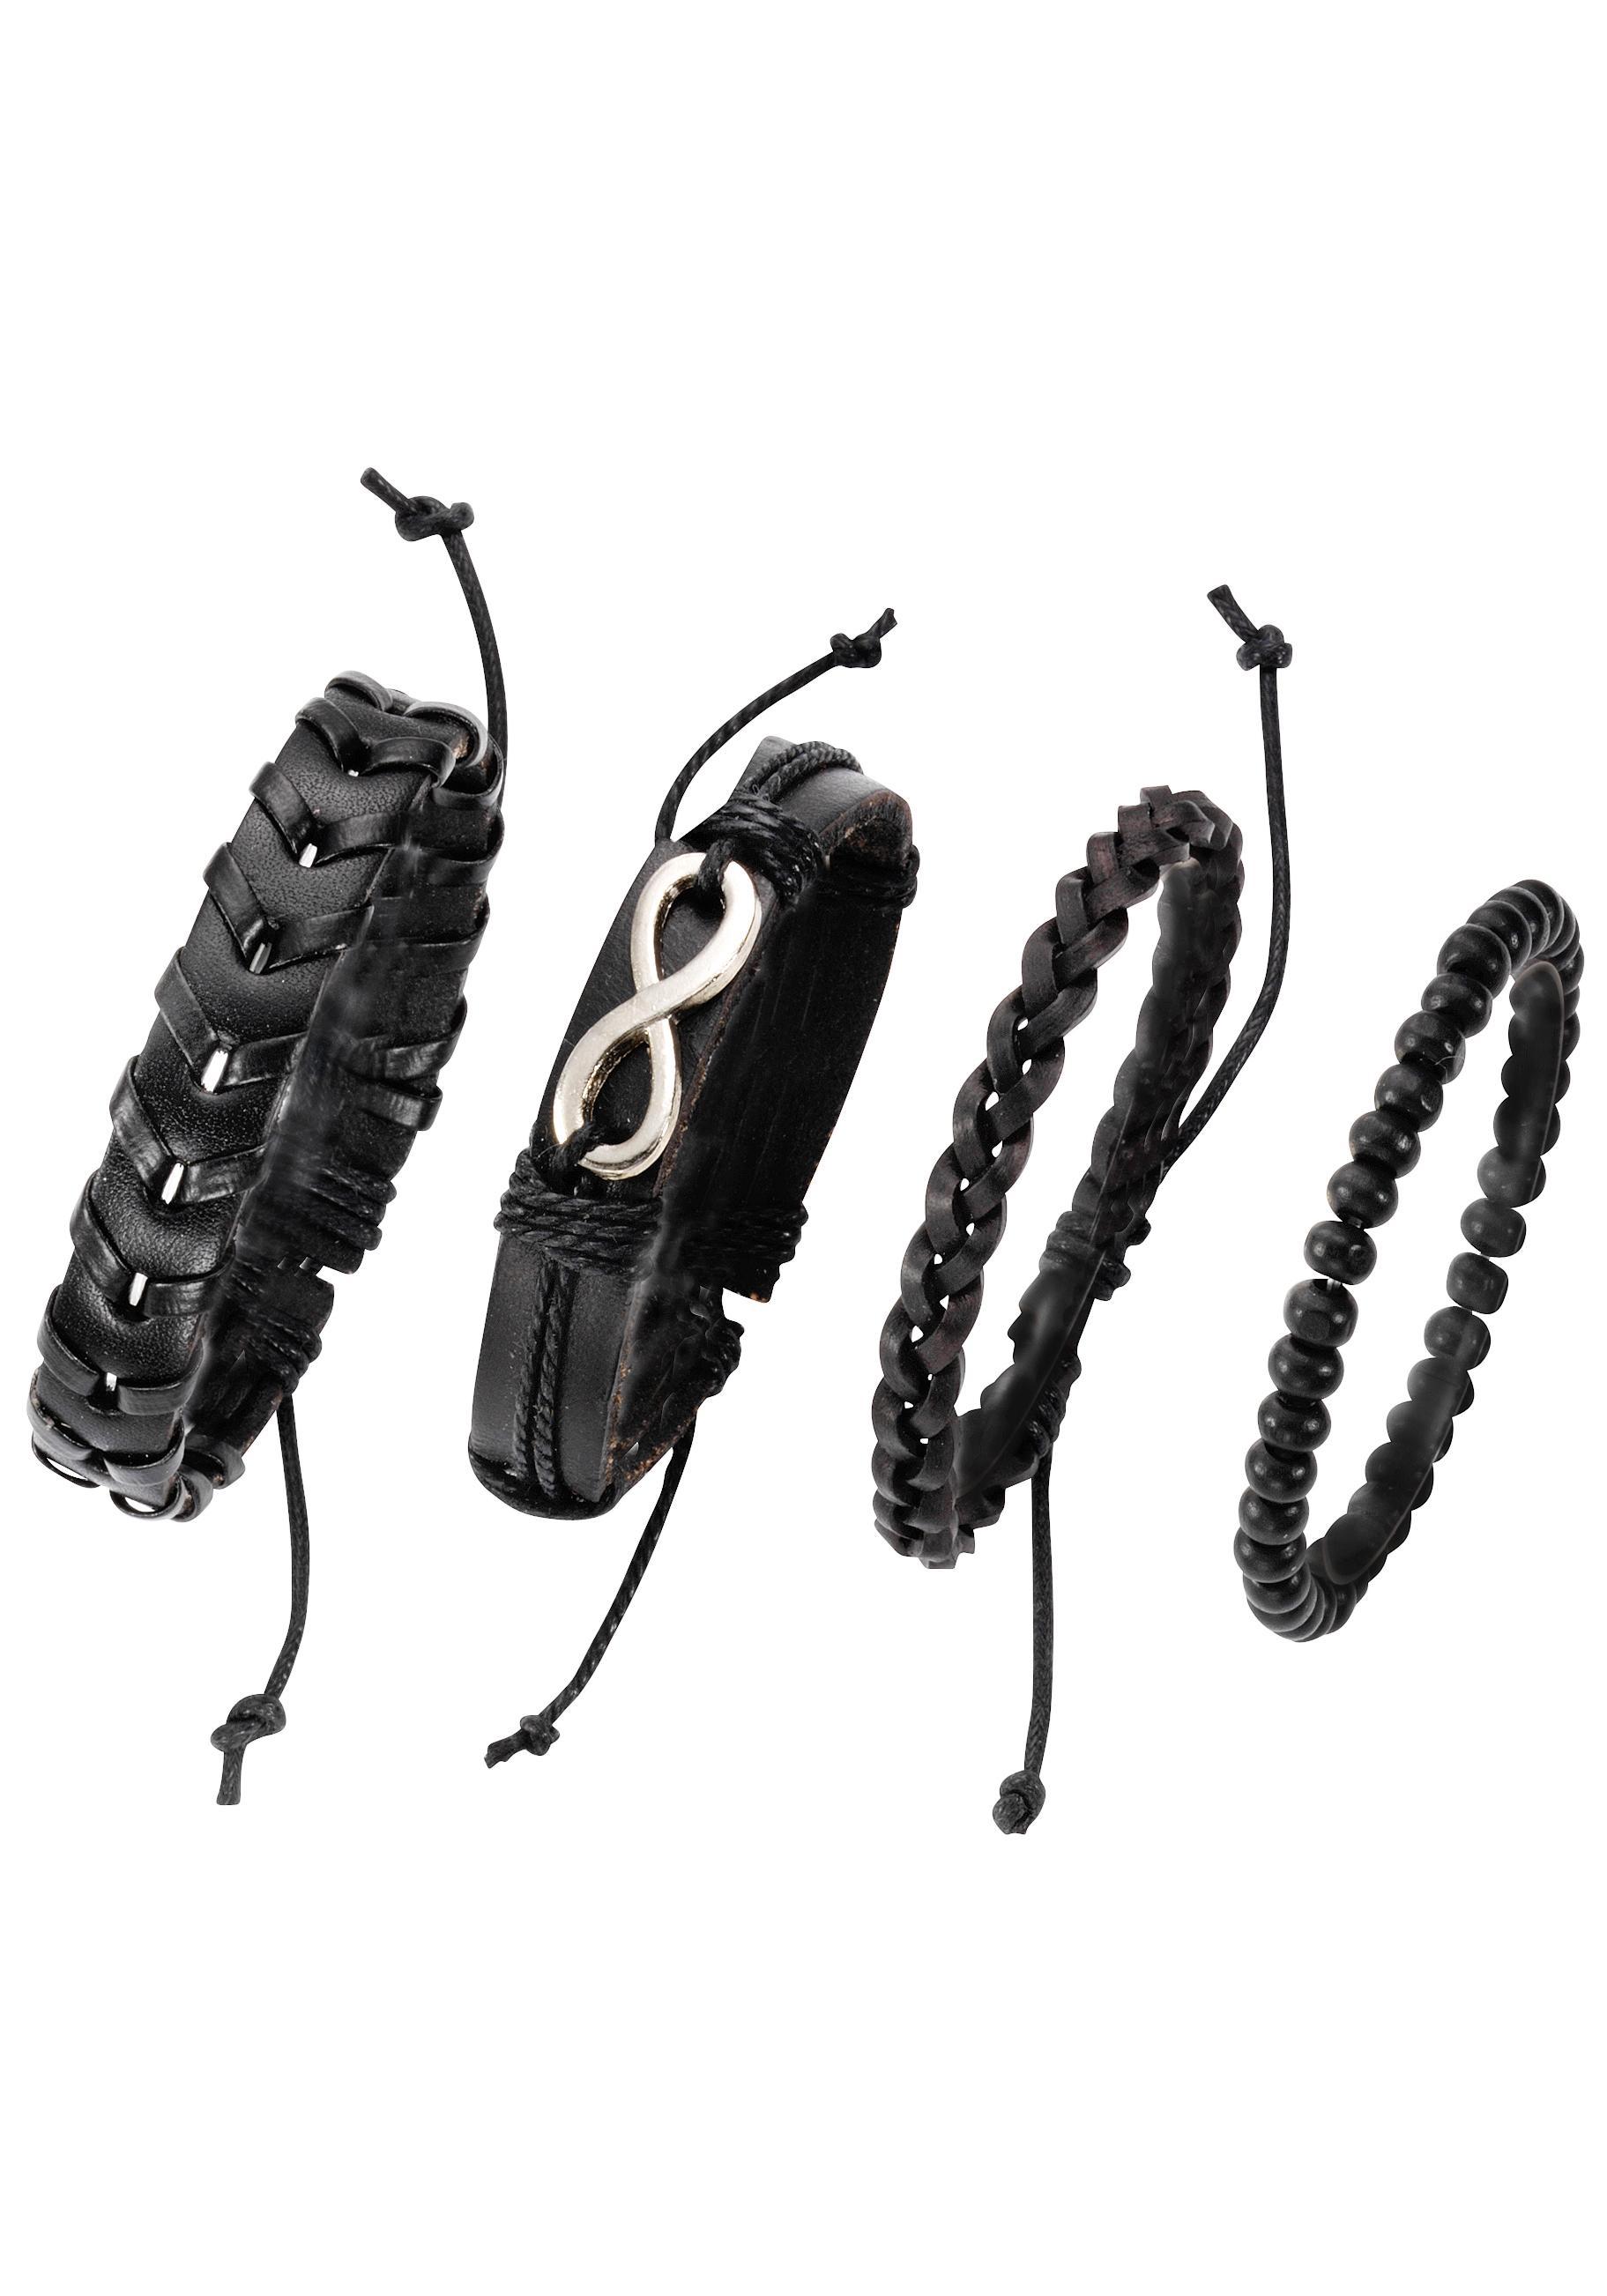 JJayz Armband Set Infinity/Unendlichkeitsschleife (Set 4 tlg)   Schmuck > Armbänder > Sonstige Armbänder   Schwarz   J.Jayz